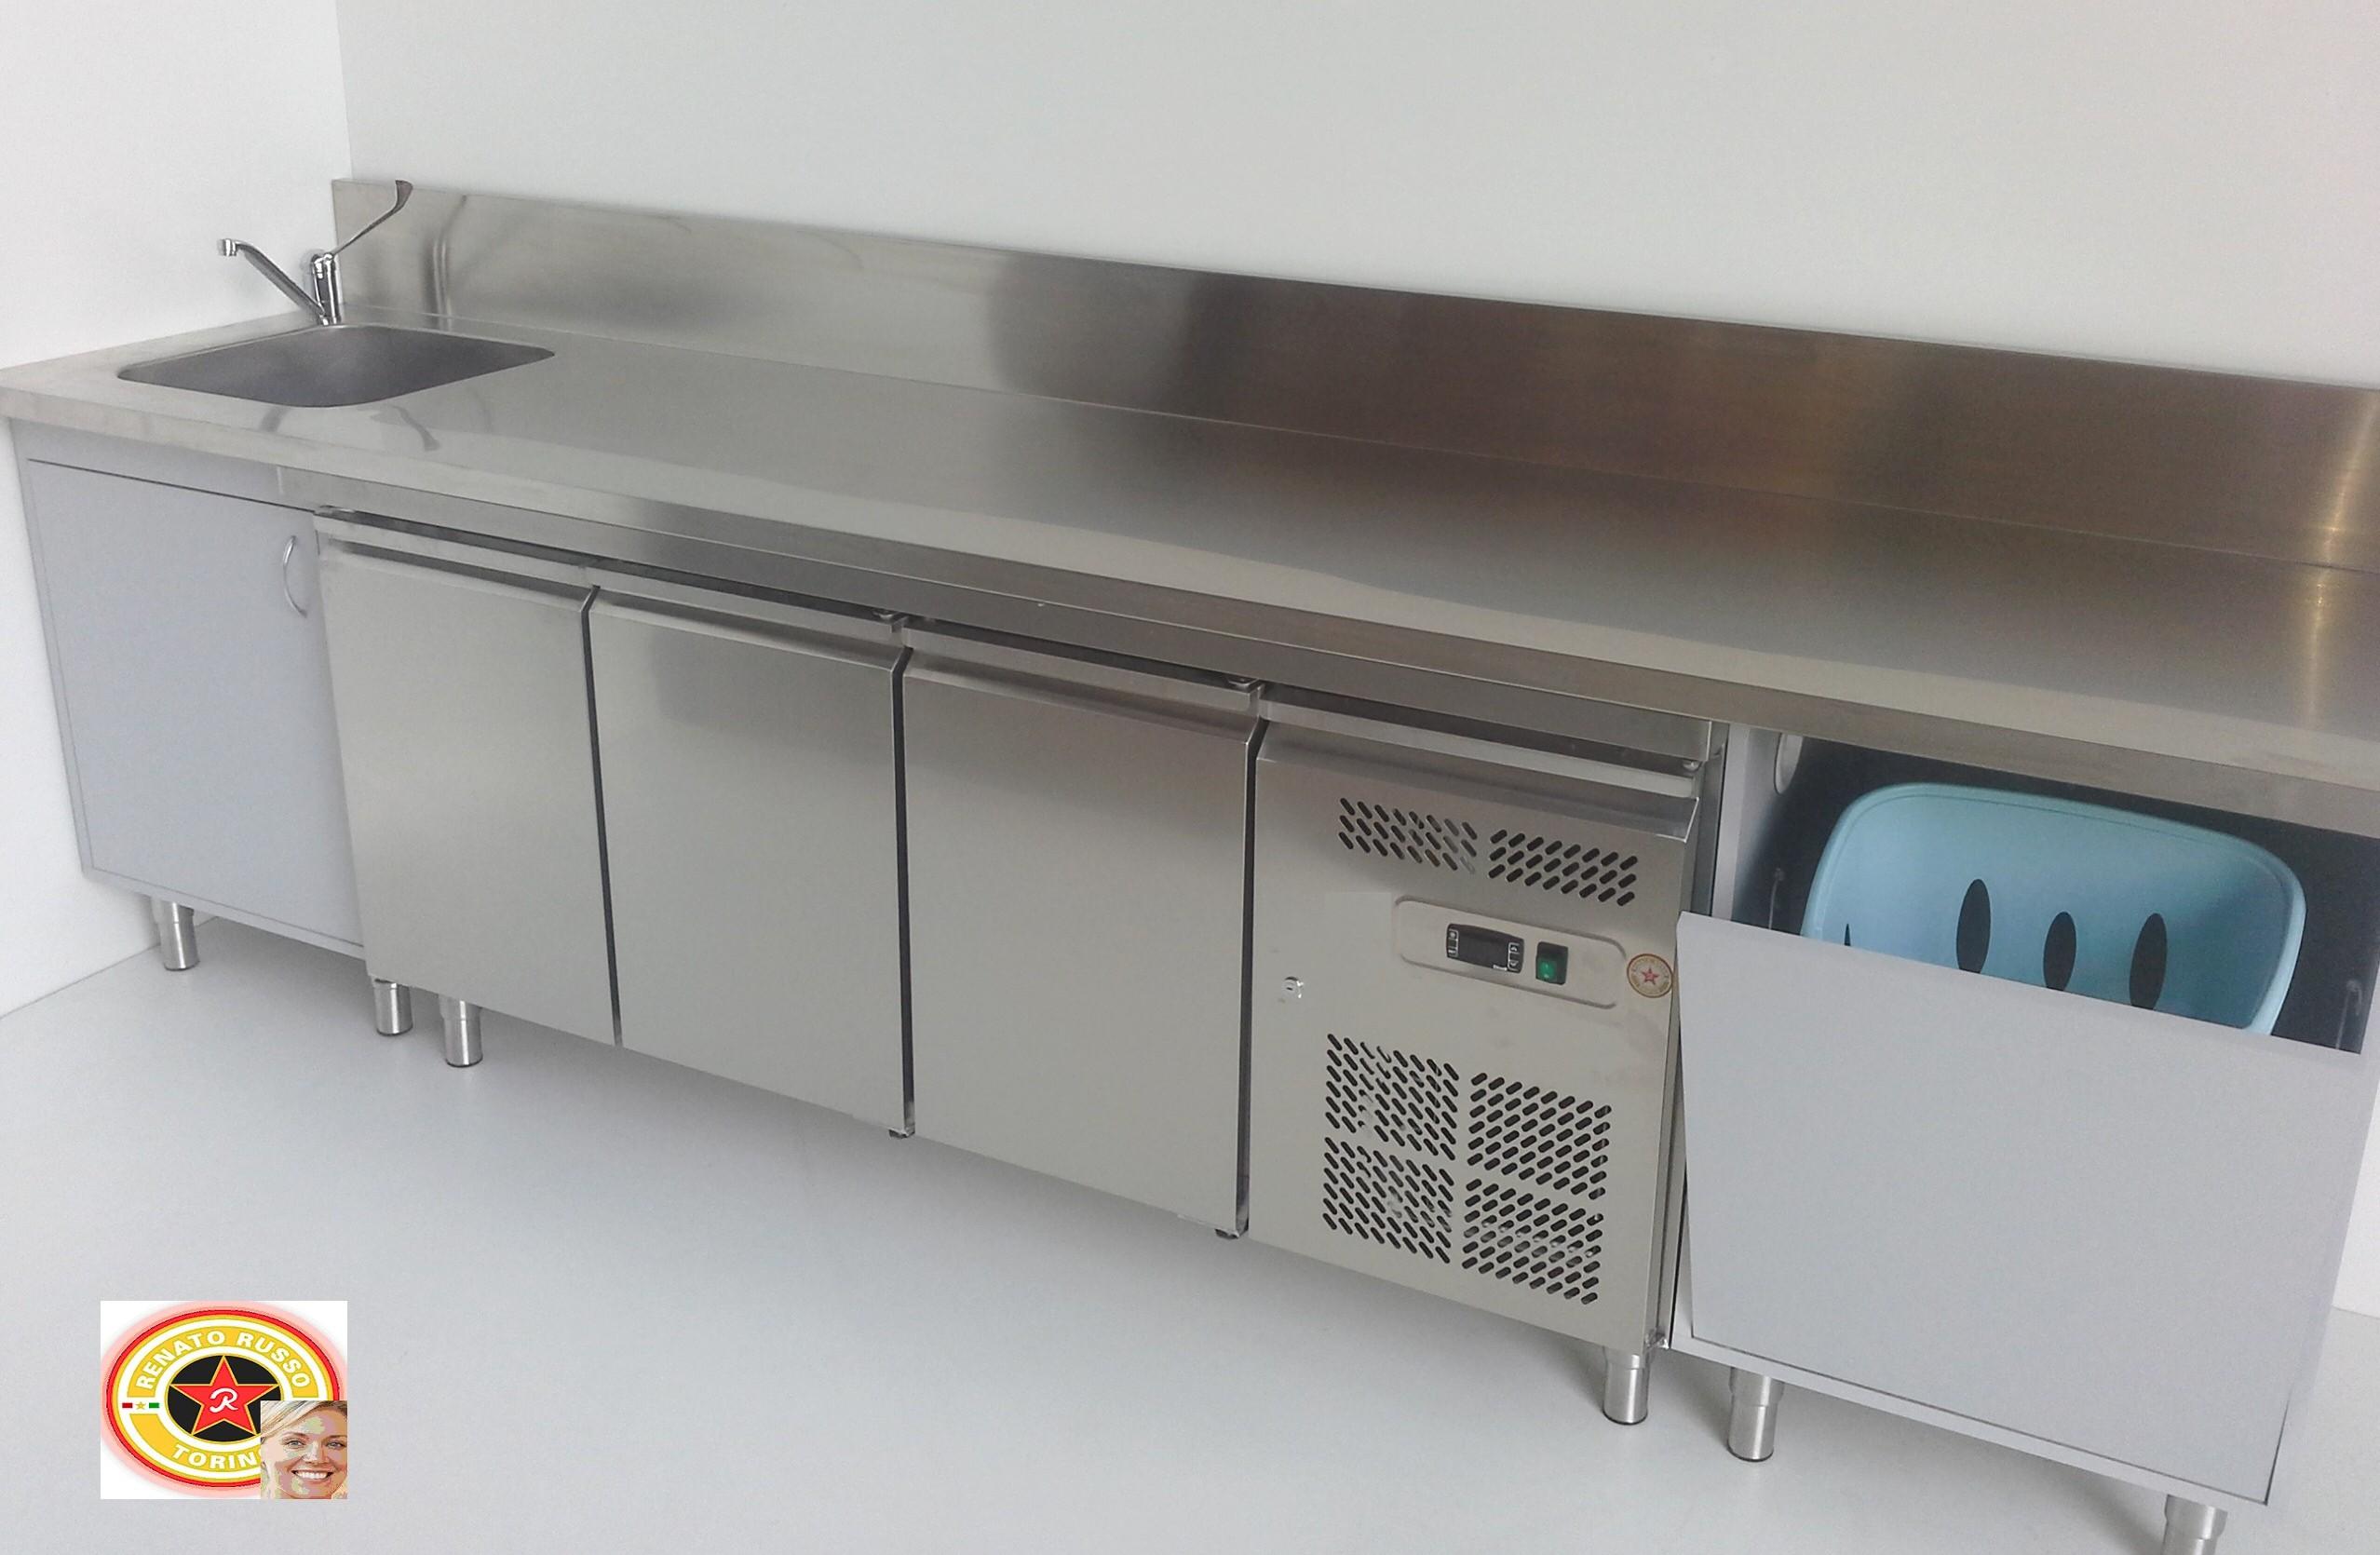 Cucine Professionali Usate Milano.Cucina Usata A Milano